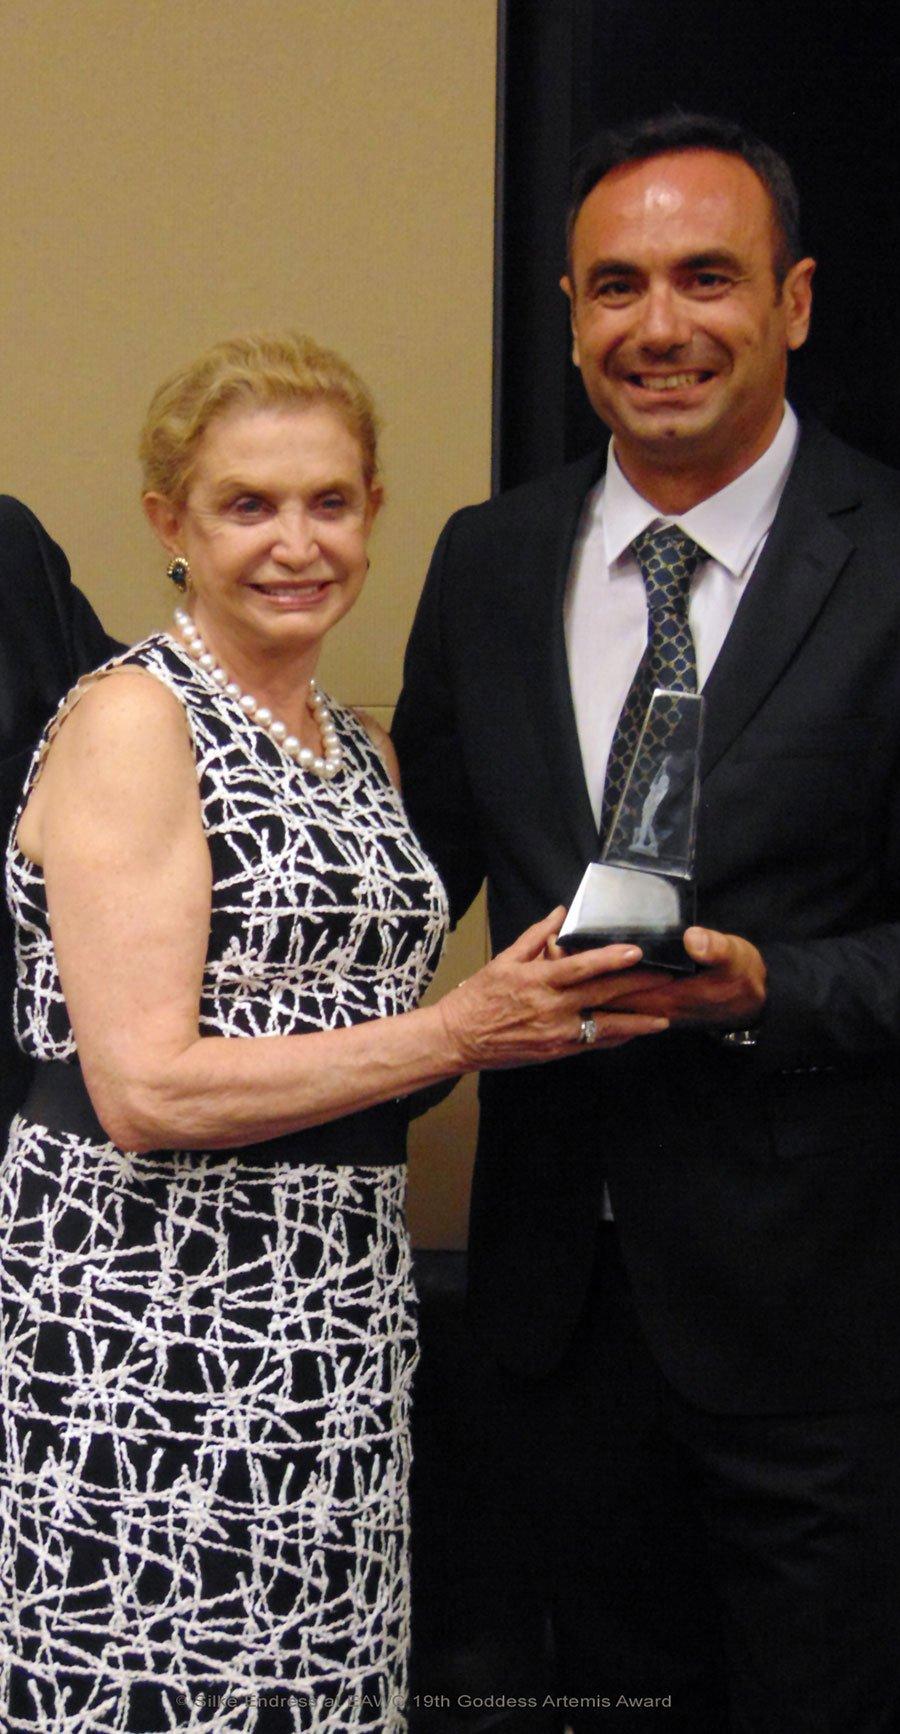 Global-Goddess-Artemis-Award-Ceremony